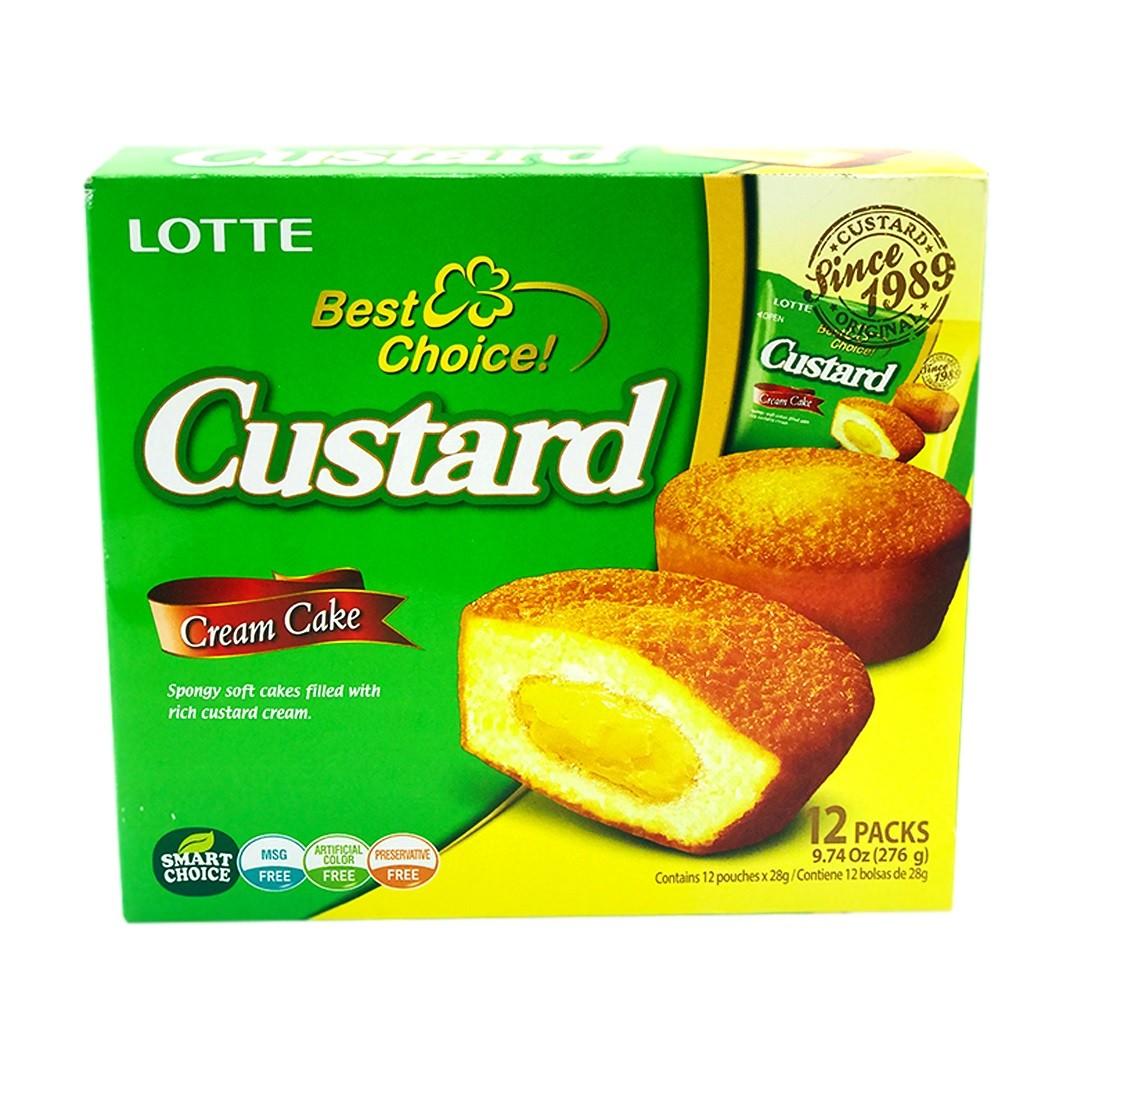 Mini Bolo Custard Soft Cake 12 unidades - Lotte 276g